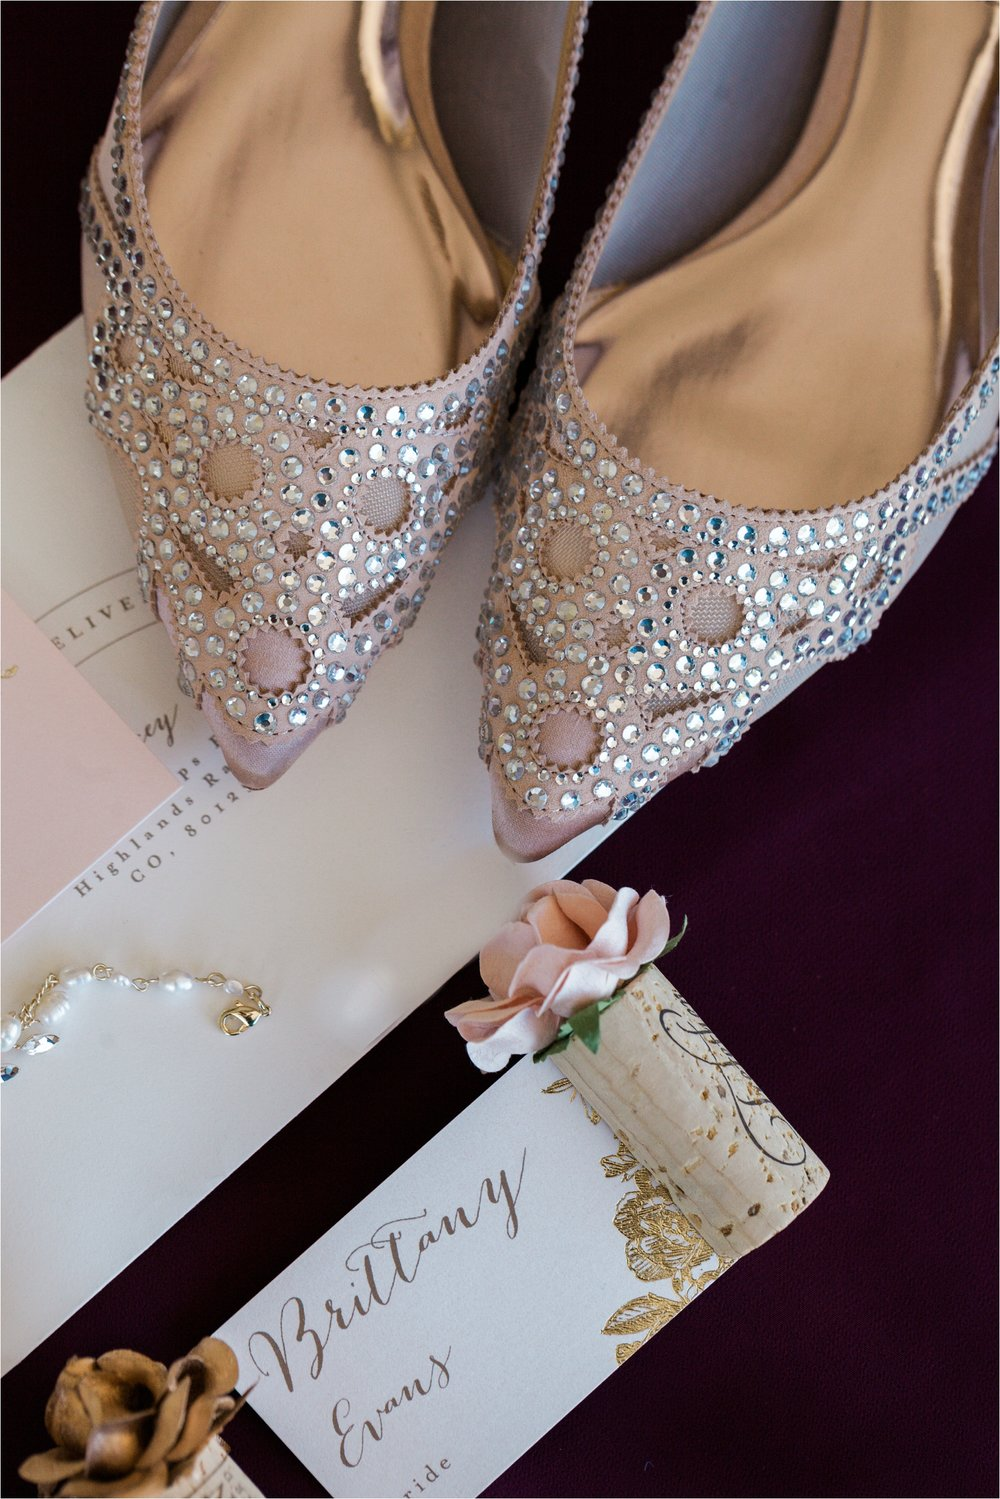 Feather-and-Oak-Photography-Cross-Keys-Vineyard-Wedding-3341.jpg